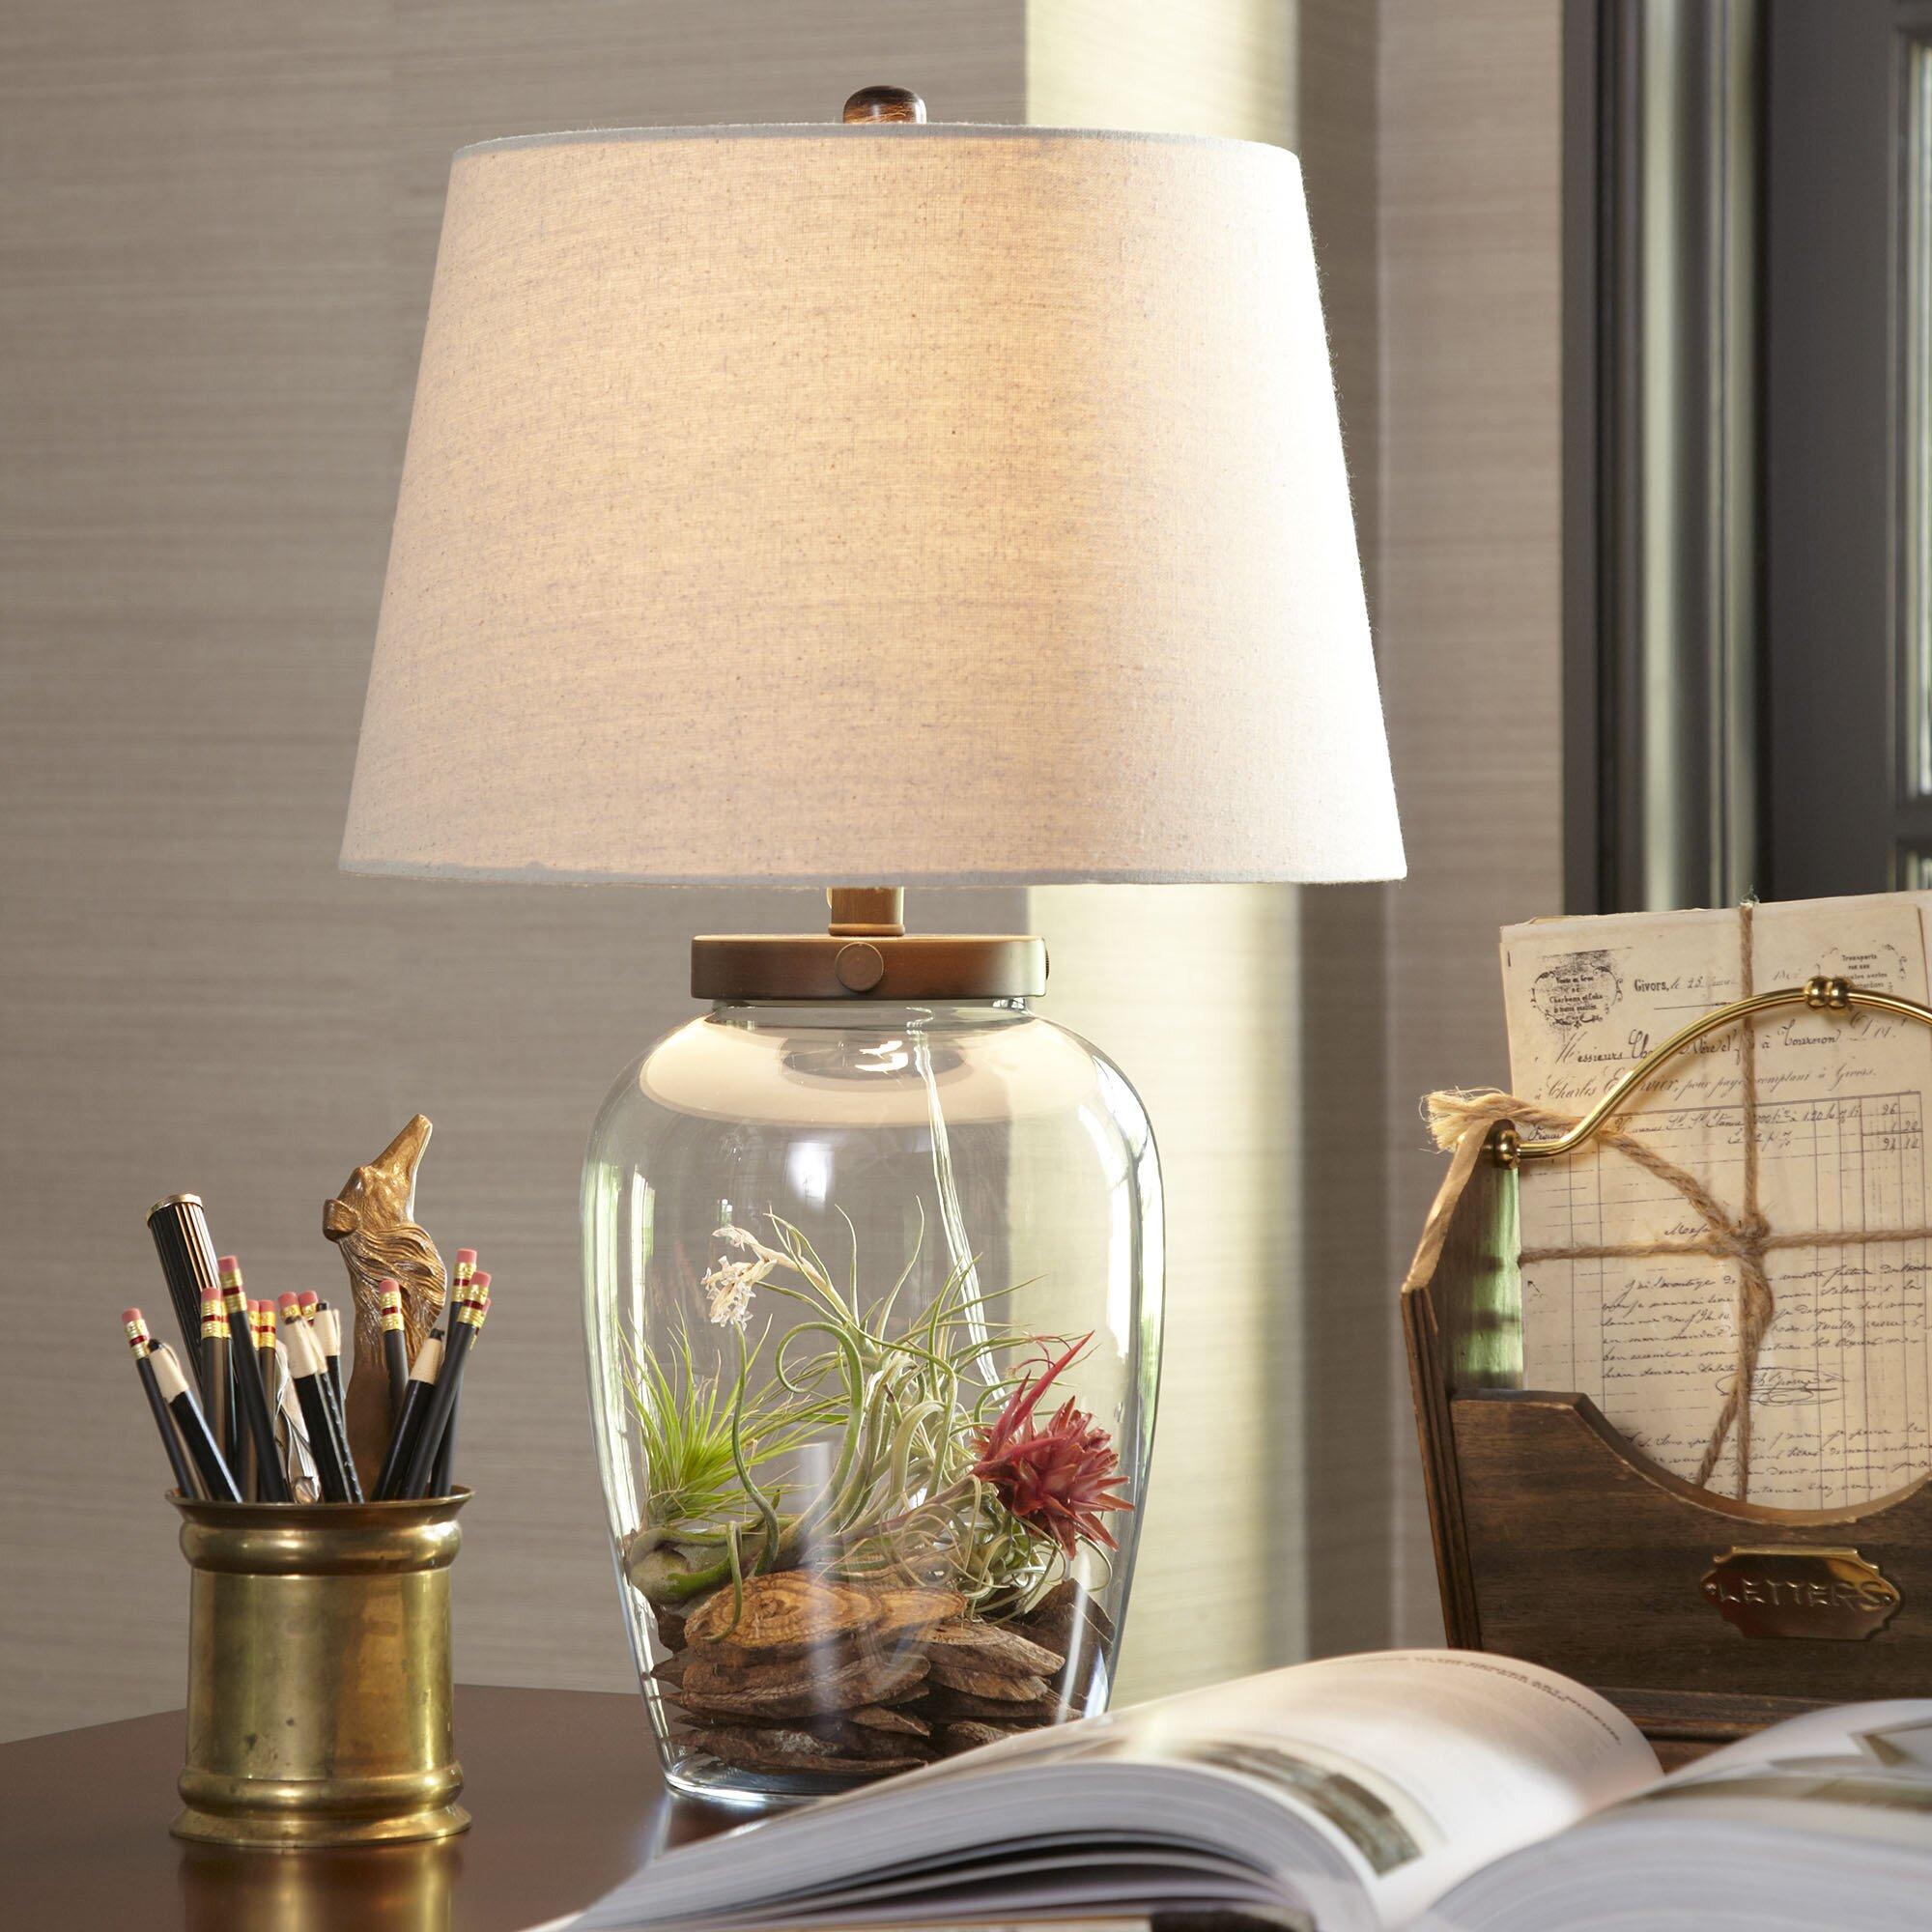 birch lane wallington glass table lamp reviews wayfair. Black Bedroom Furniture Sets. Home Design Ideas